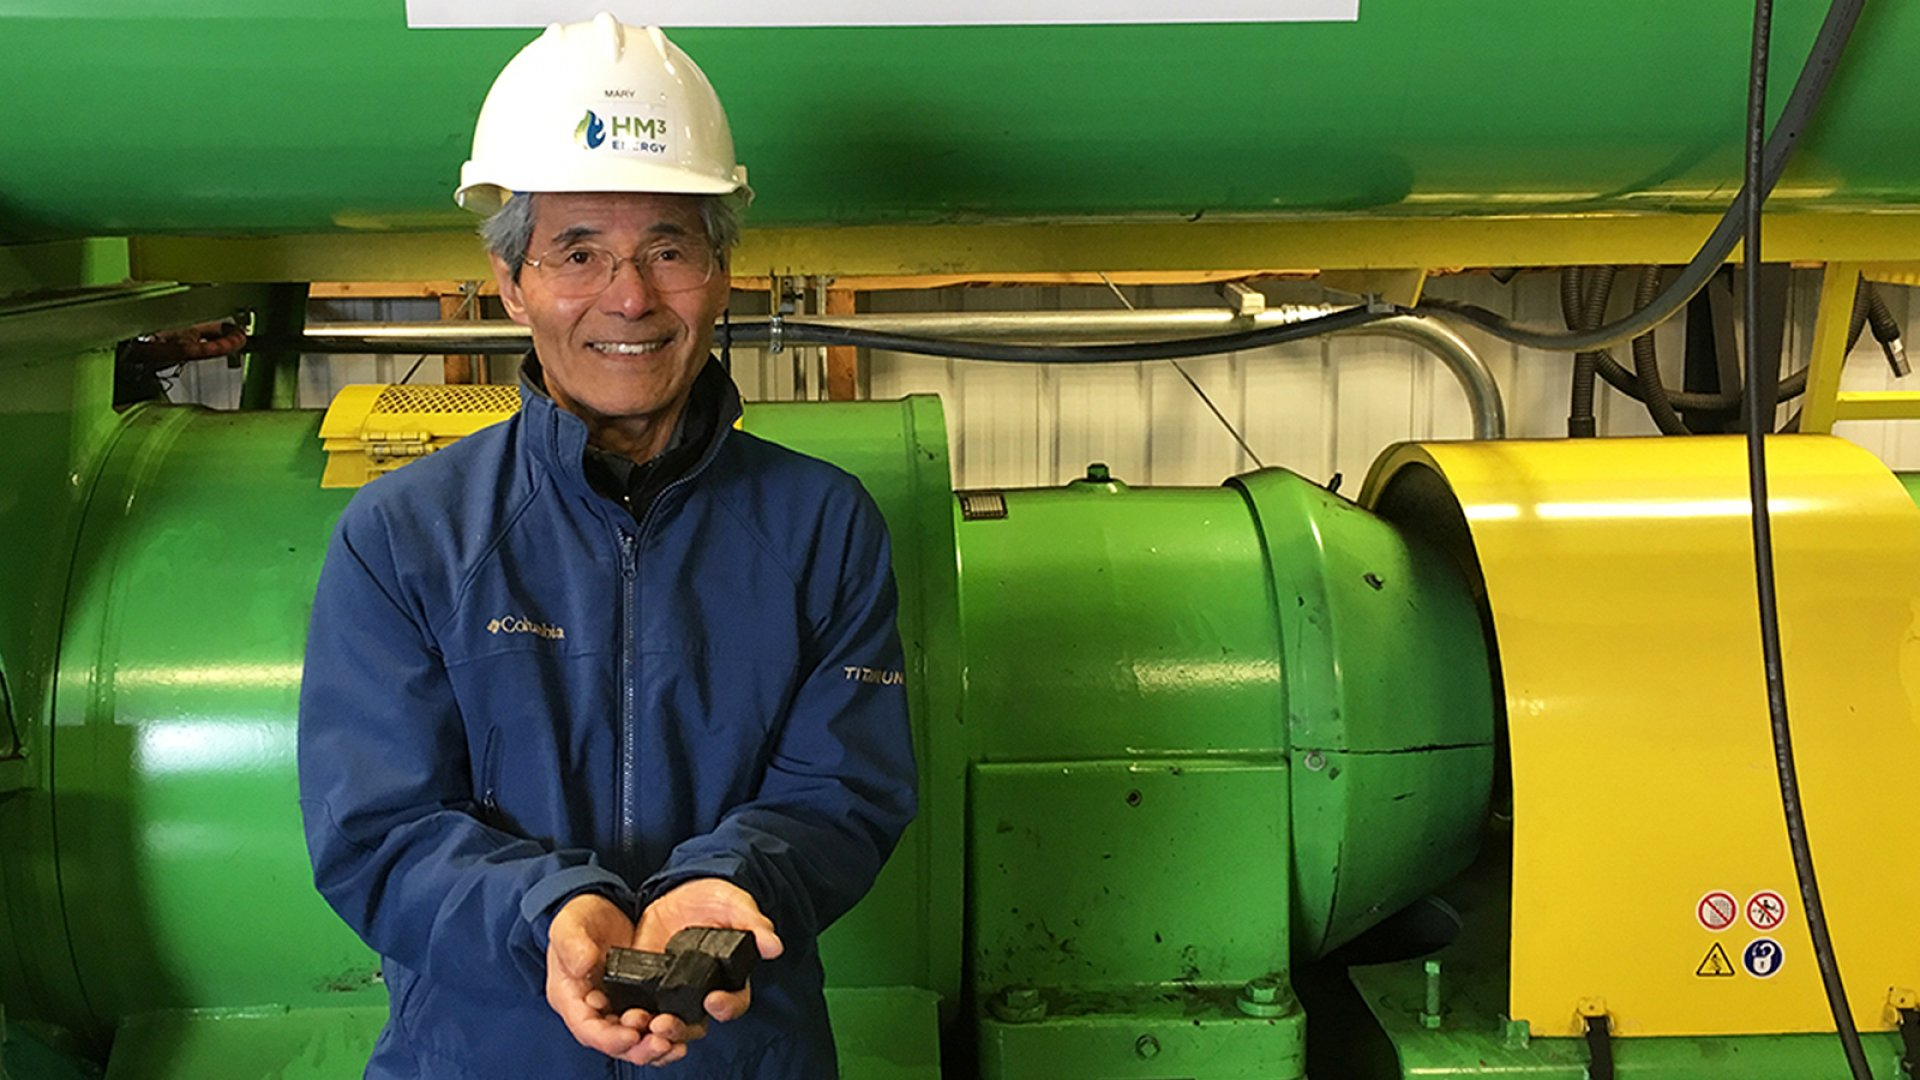 Hiroshi Morihara, founder of HM3.